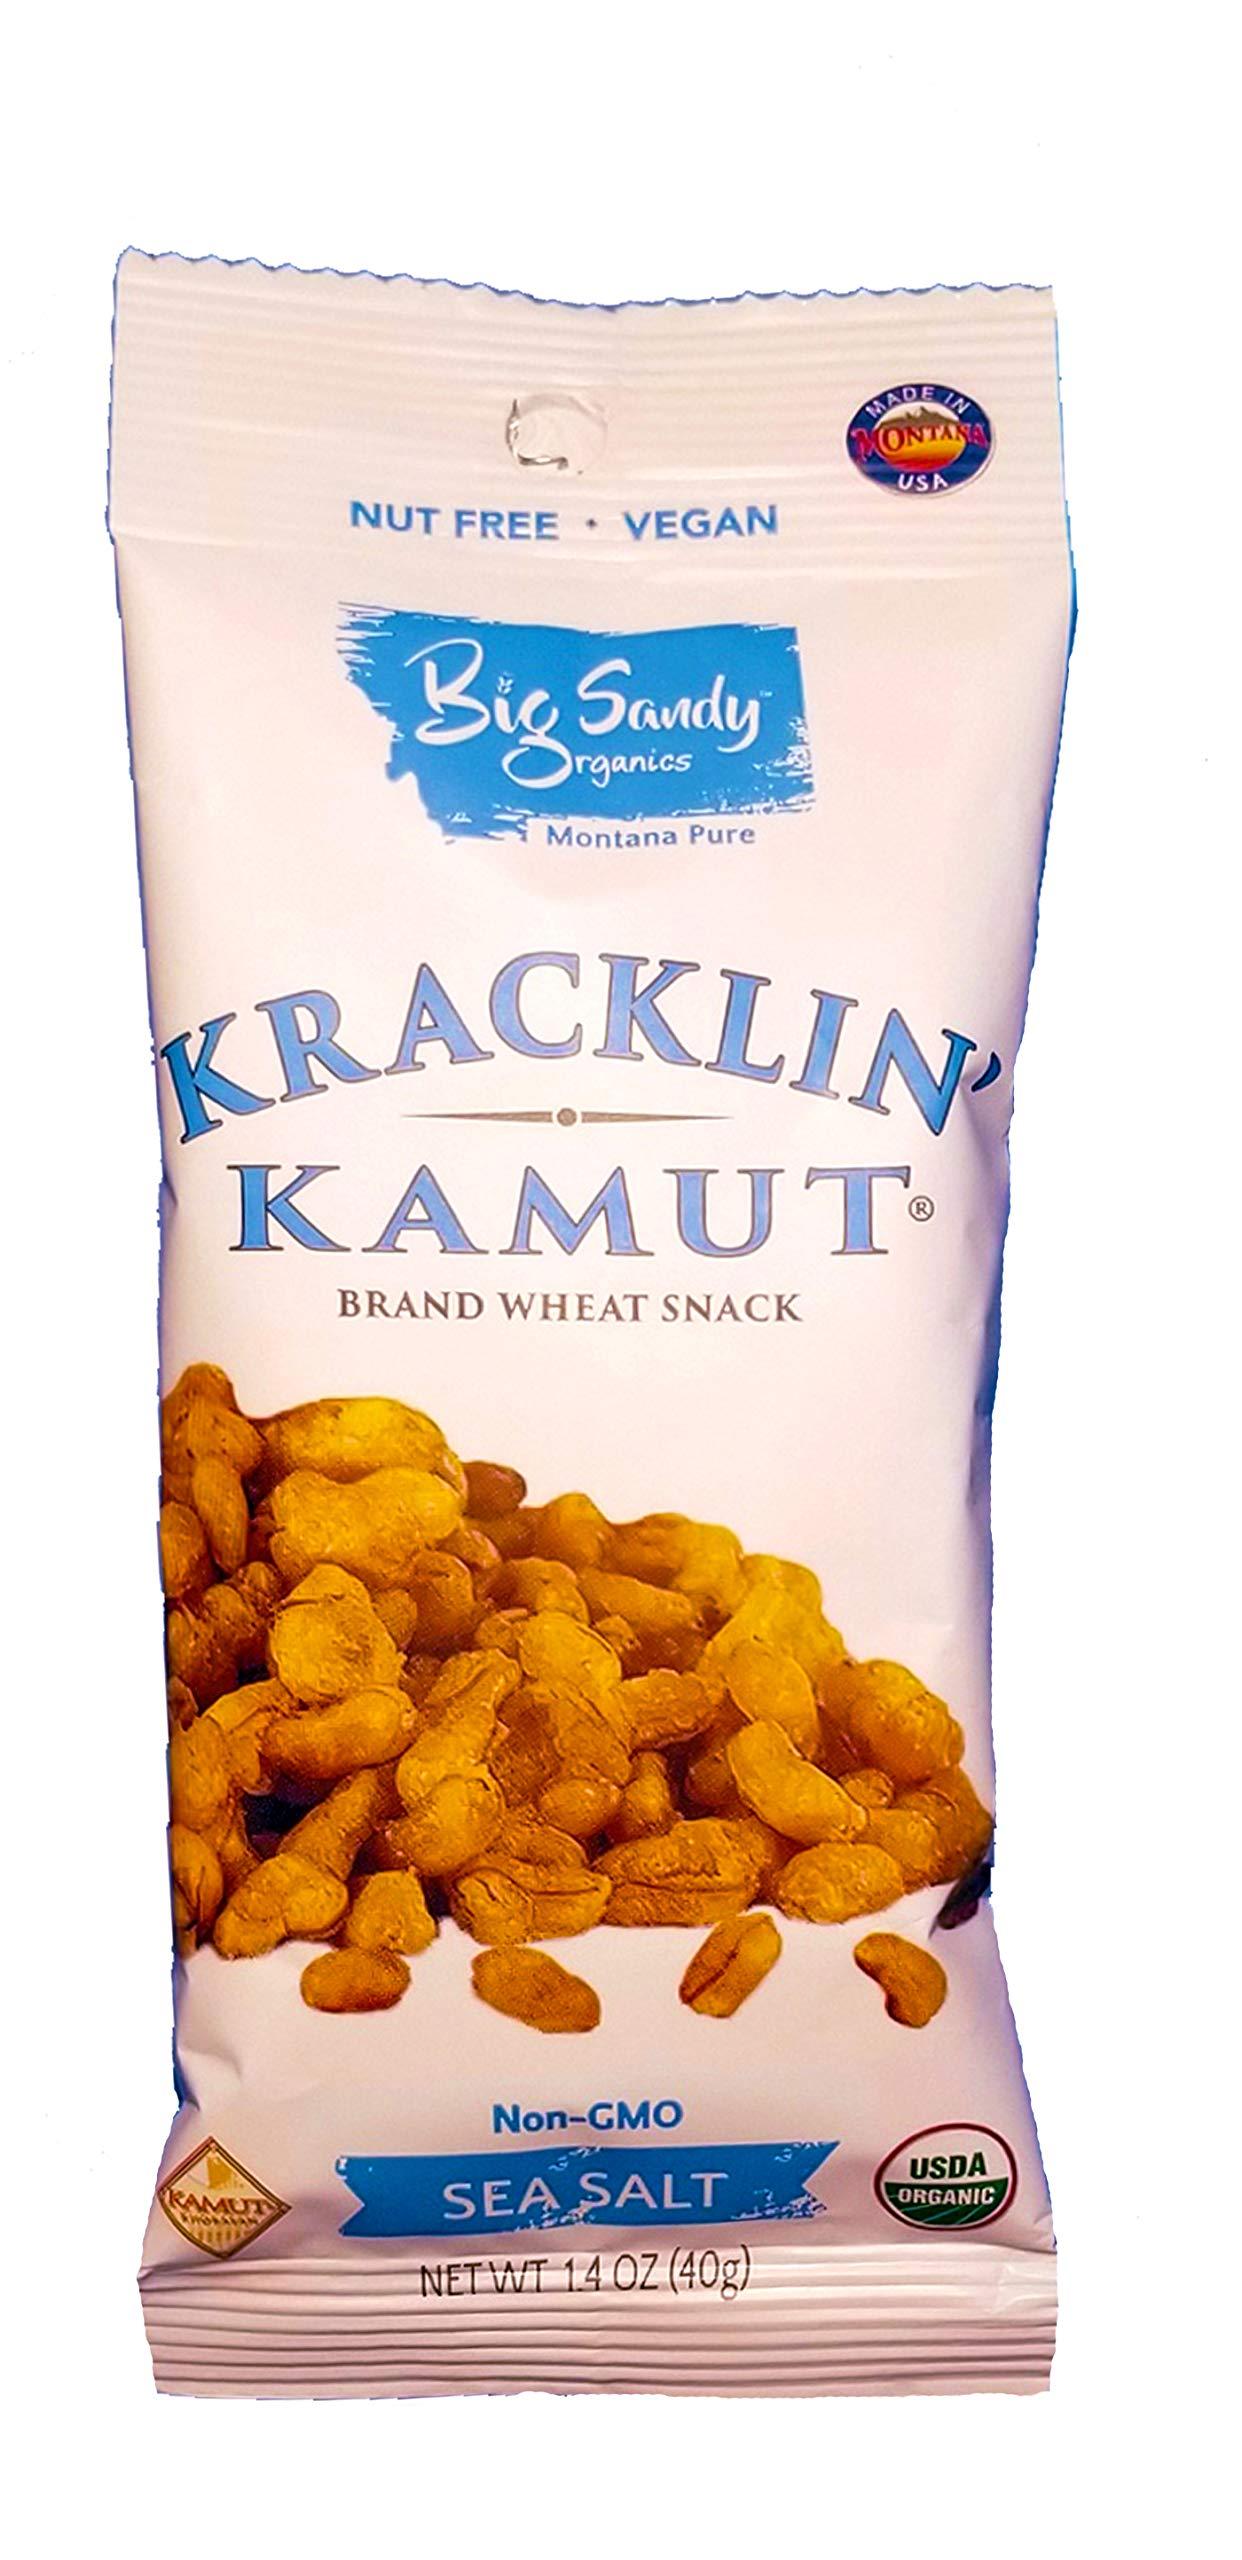 Organic Hand Roasted Ancient KAMUT Grain| Strangely Addicting | Nut Free | Vegan| (24 pack)